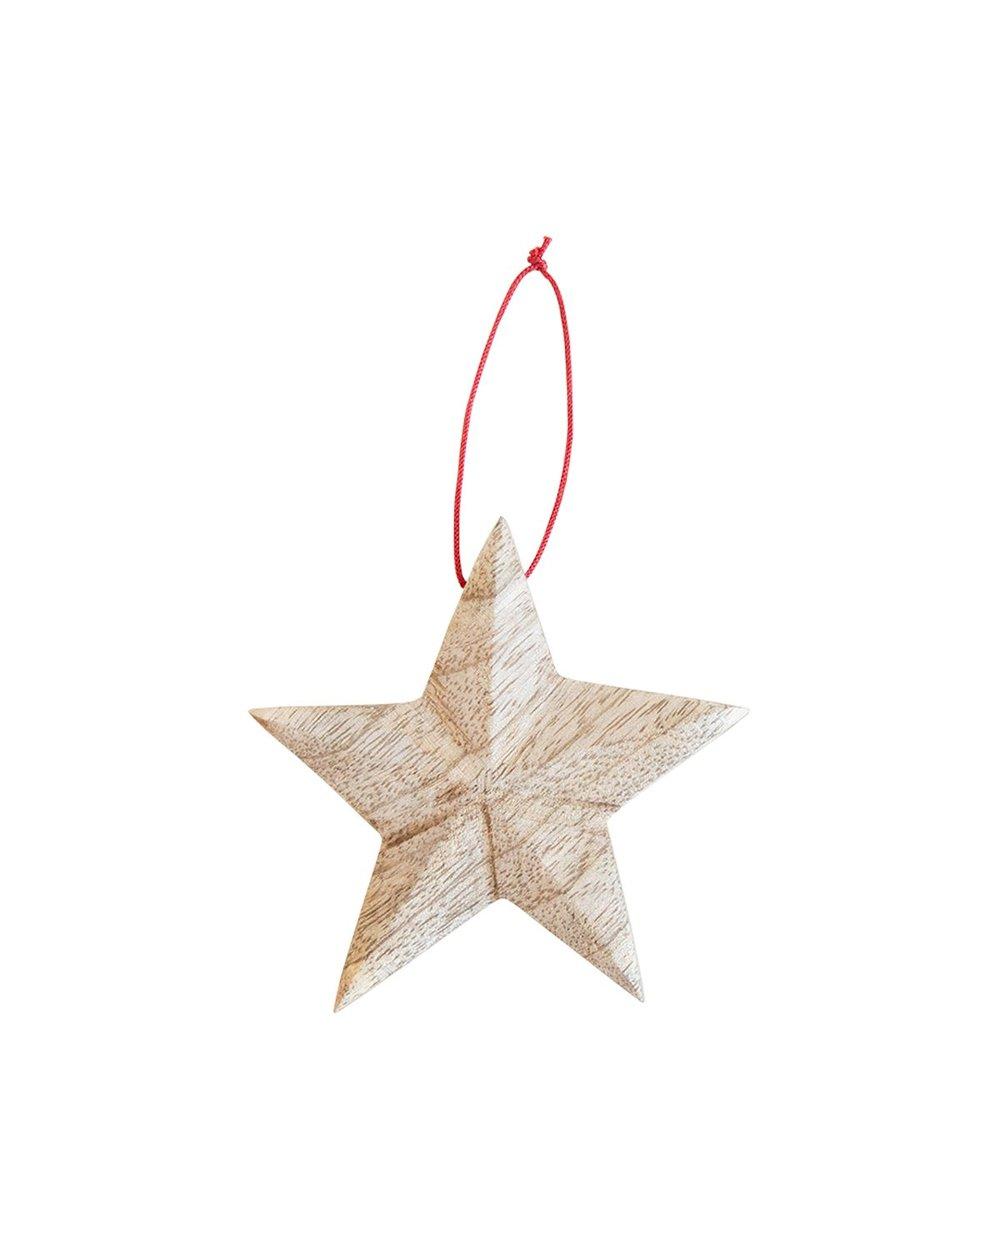 Wooden_Star_Ornaments_2.jpg